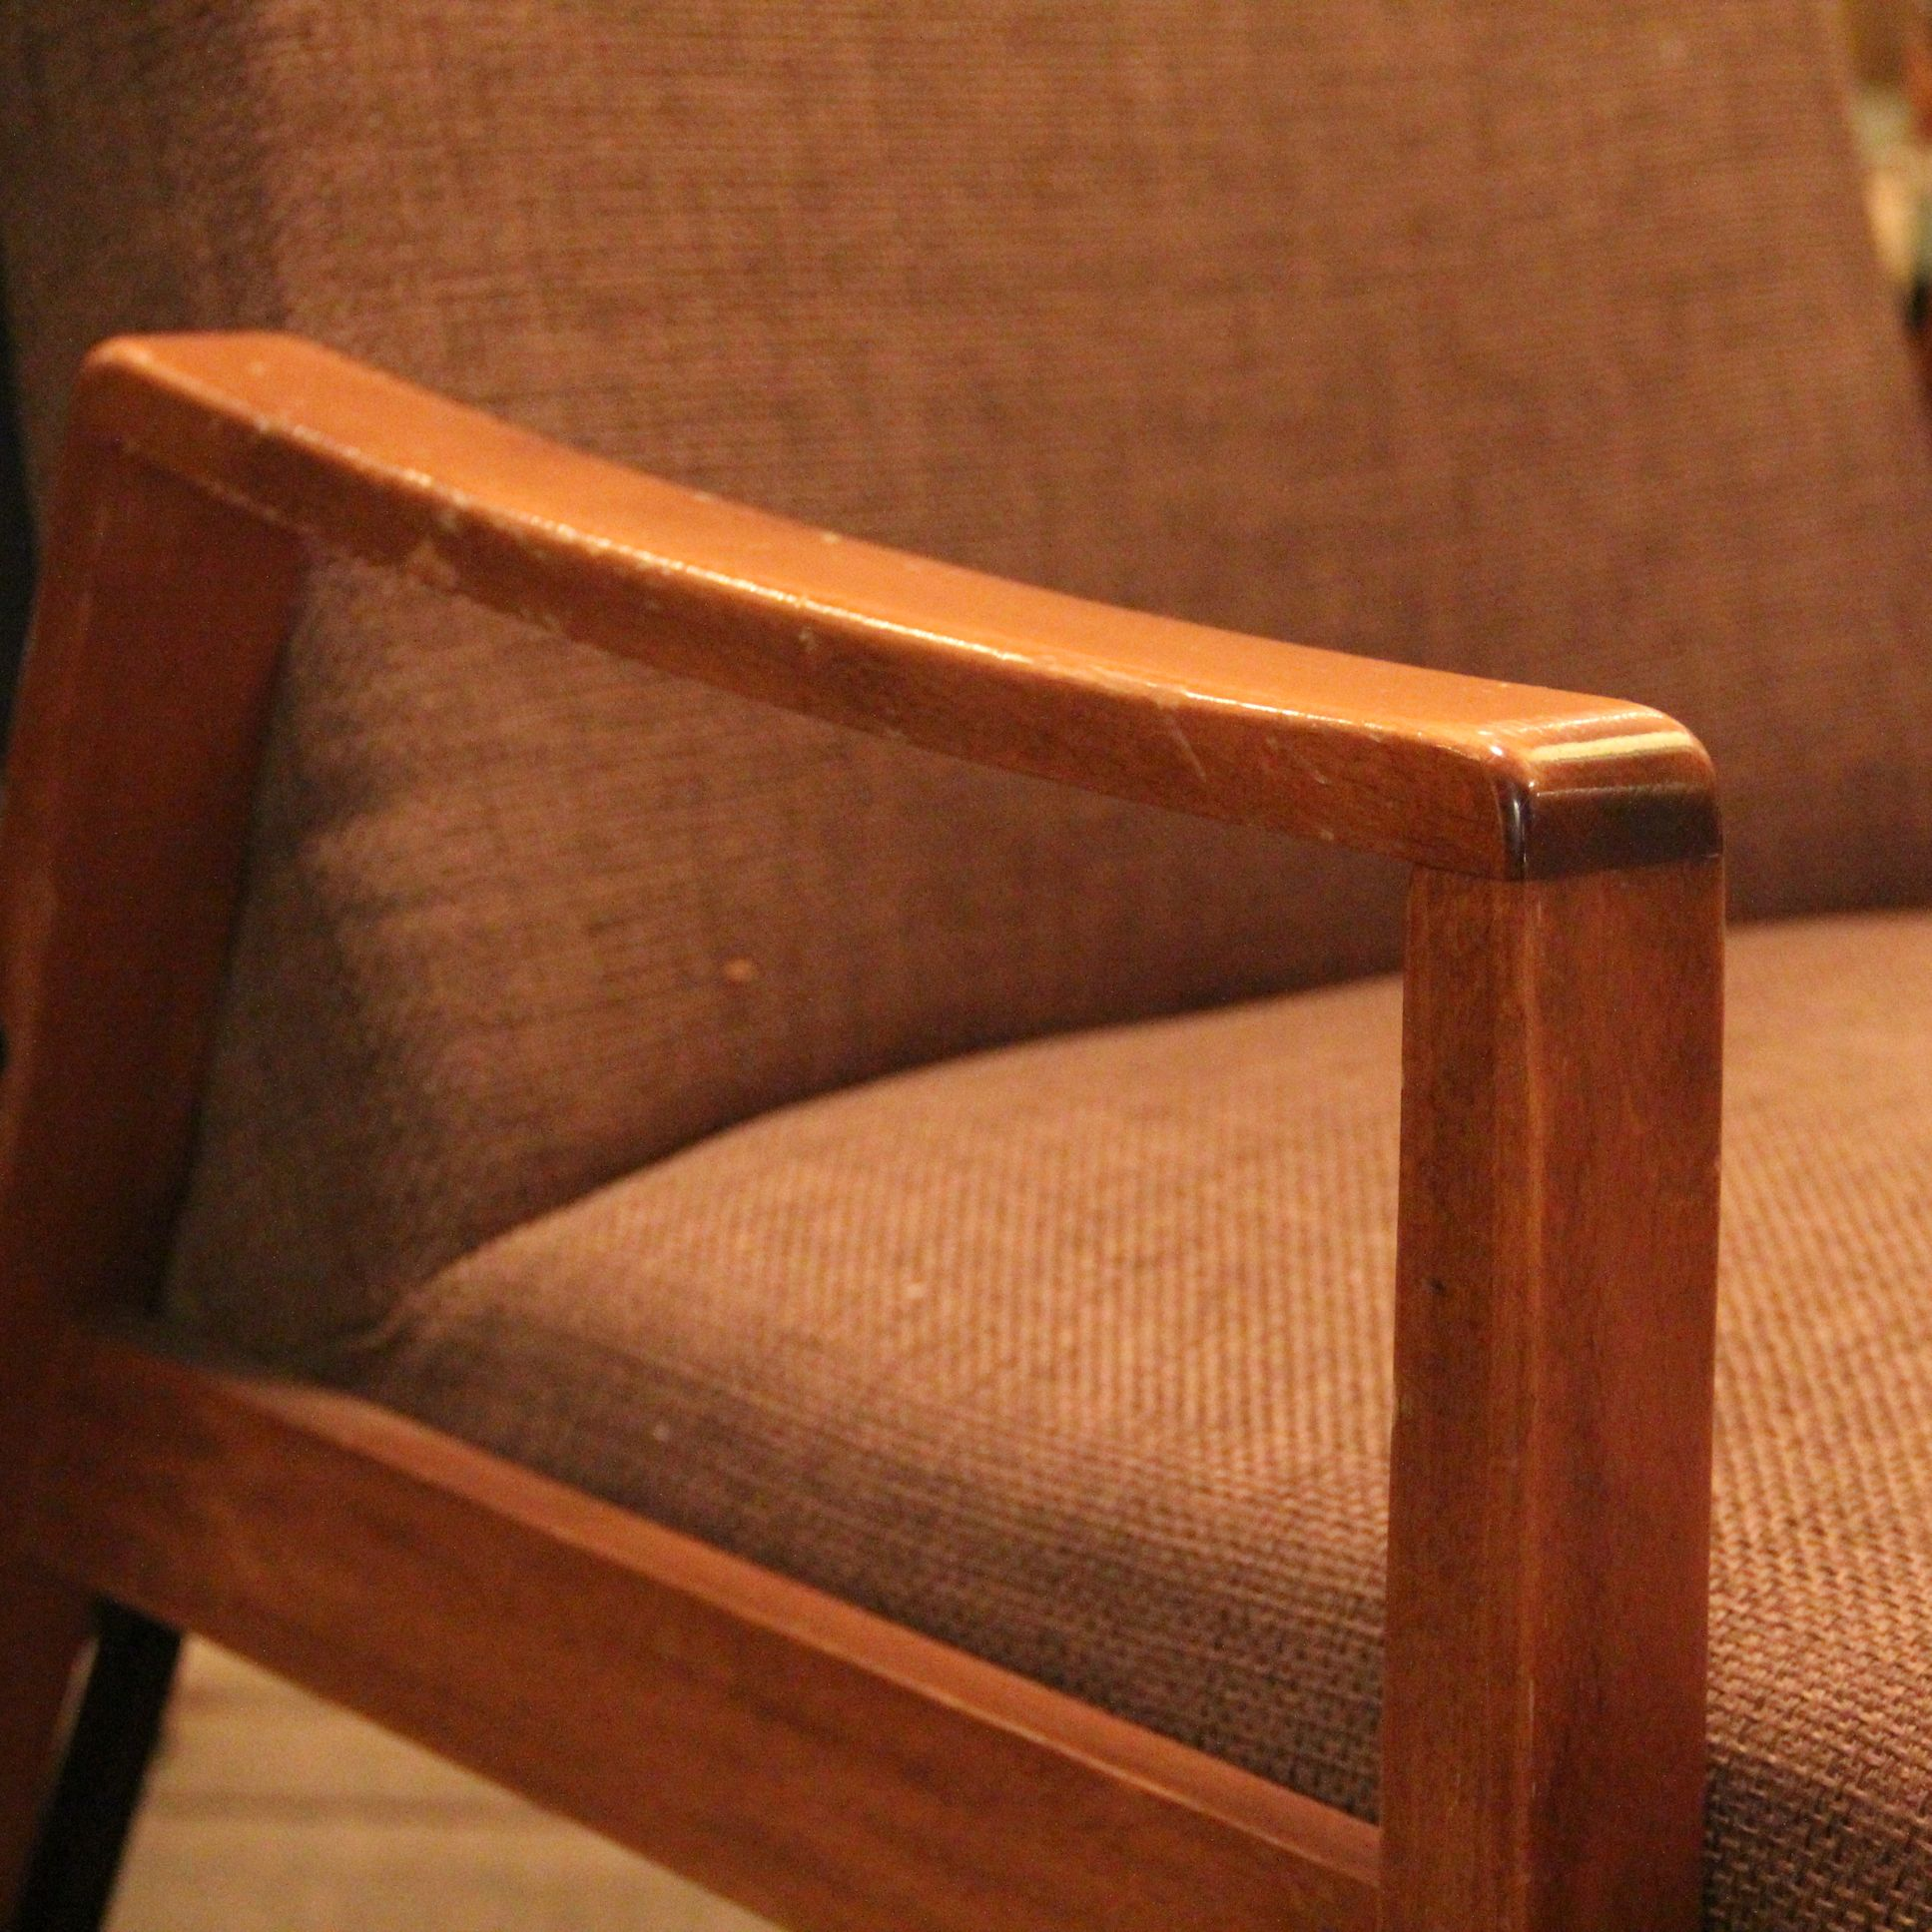 01163 armlehnstuhl im d nischen design wandel antik for Design armlehnstuhl